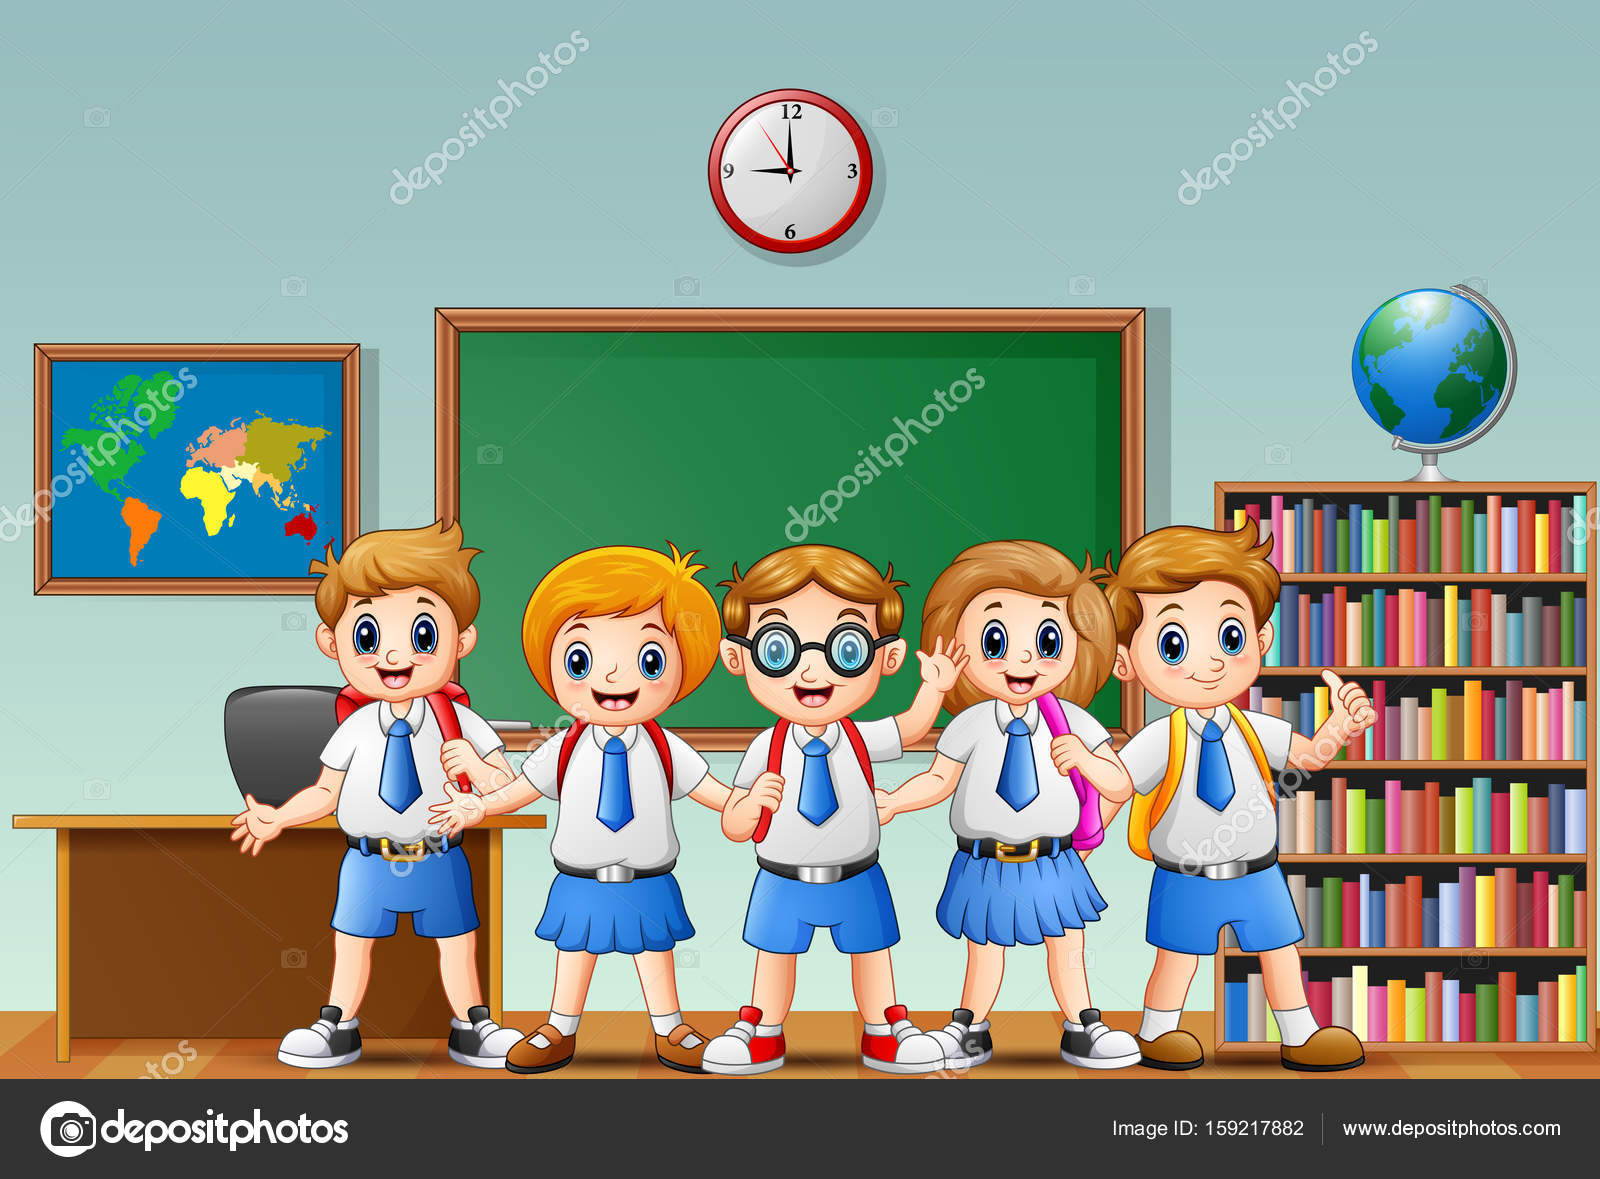 Dibujos Caras De Niños Felices Animadas: Dibujos Animados De Niños Felices De La Escuela